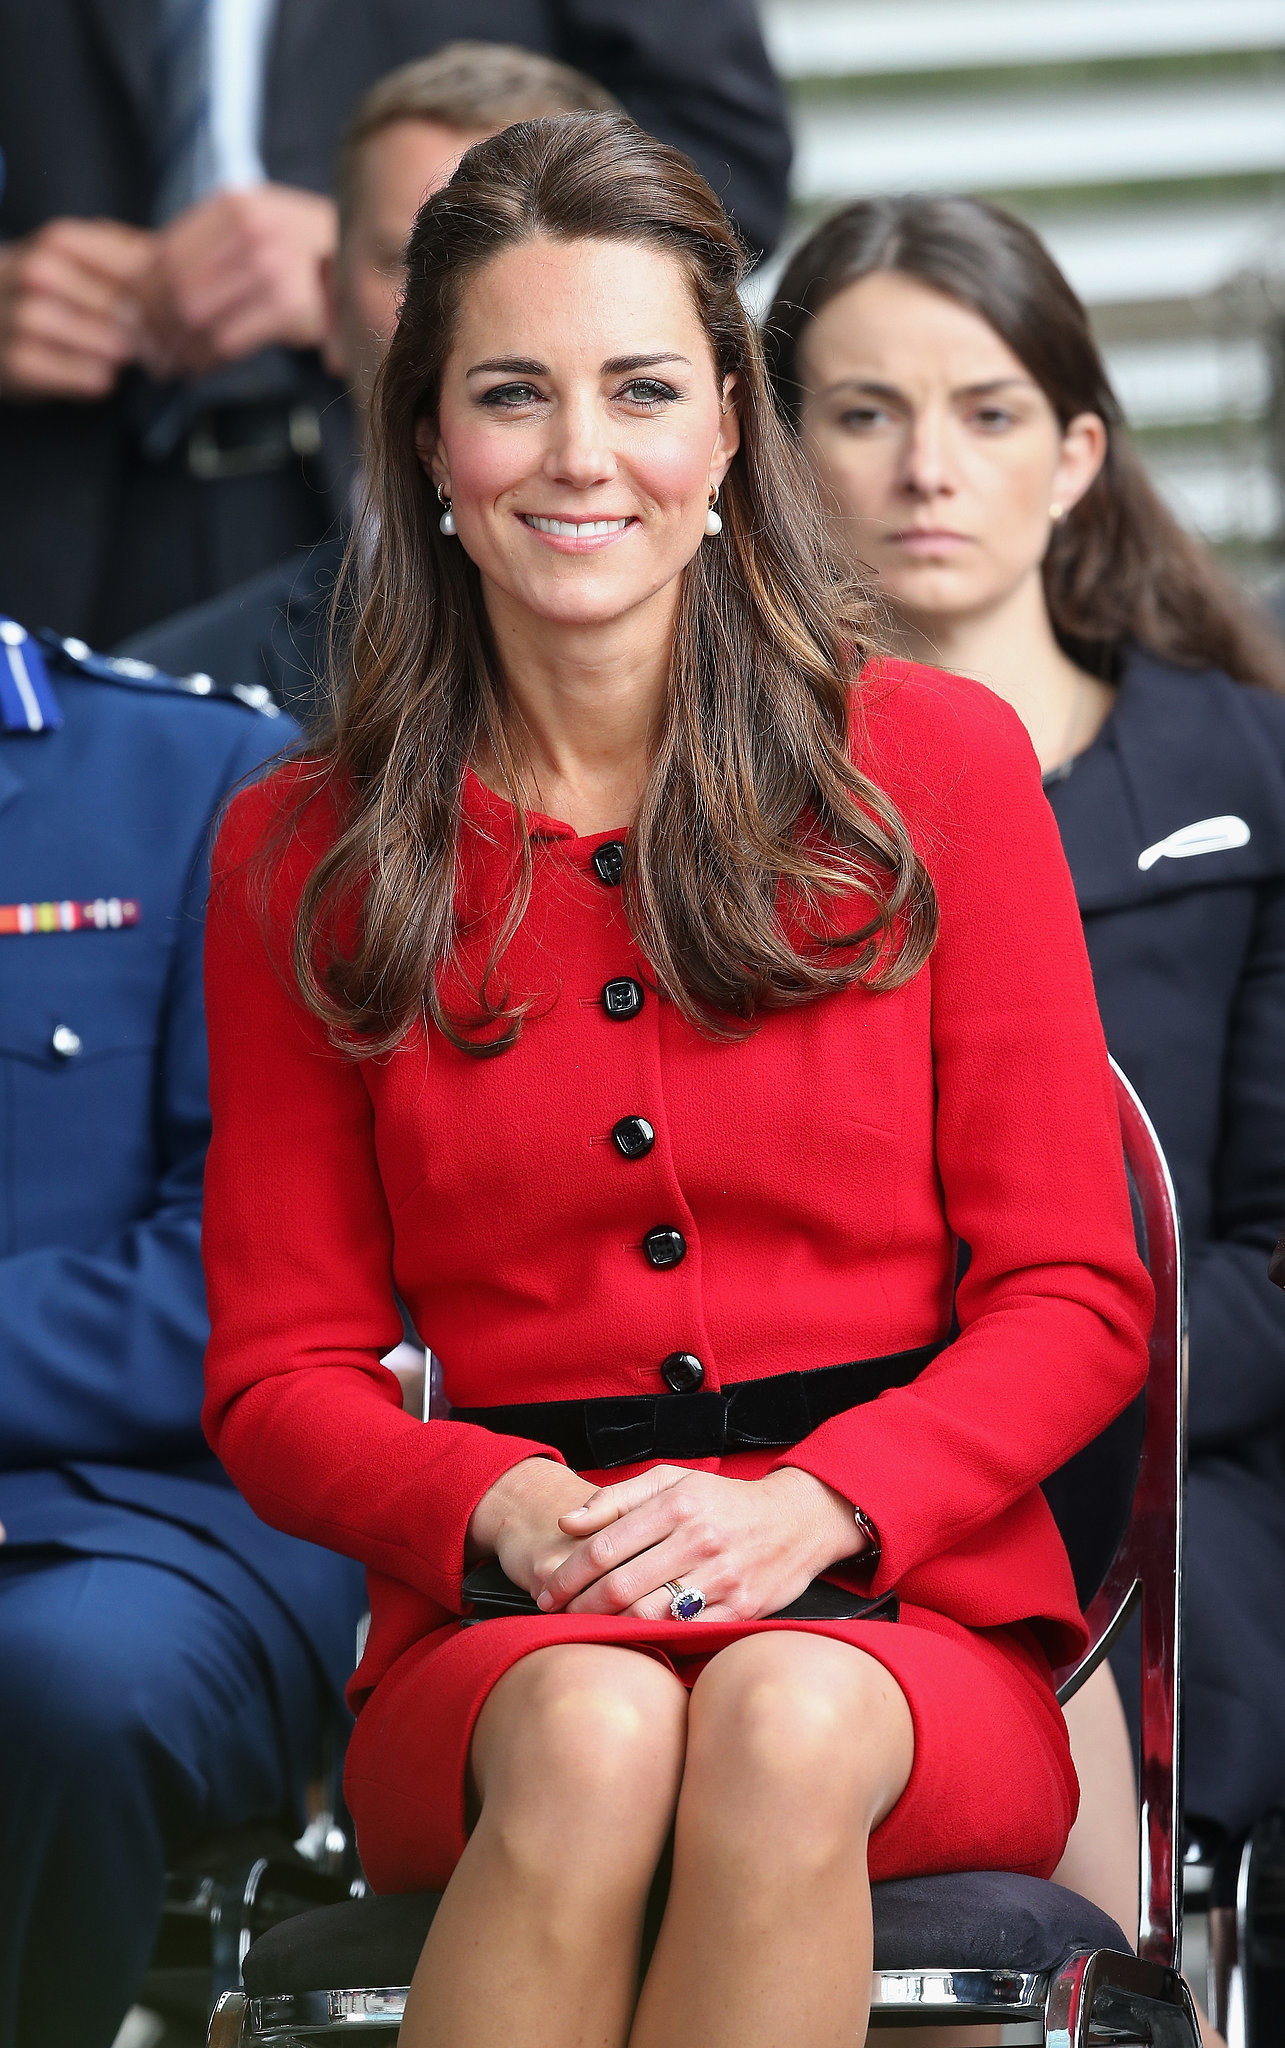 Even Kate Middleton Has Awkward Moments